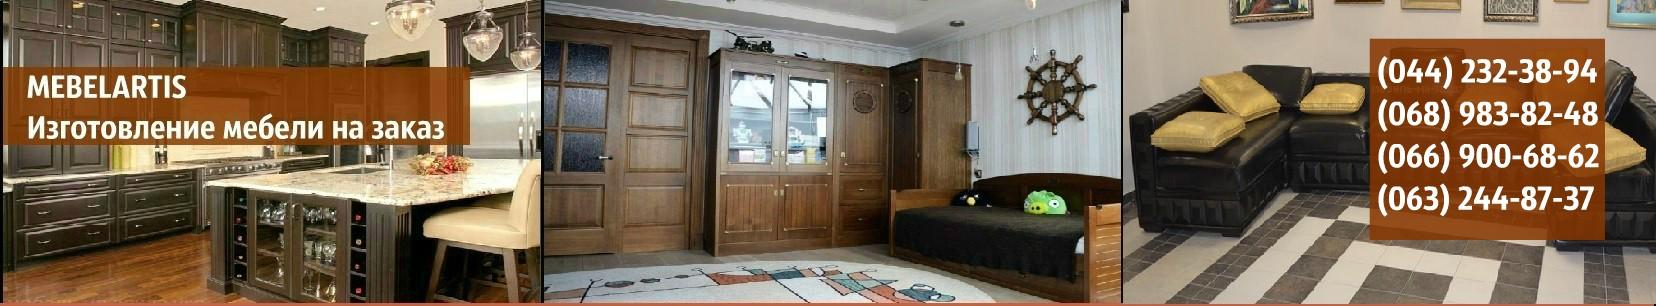 Производство мебели МебельАртис